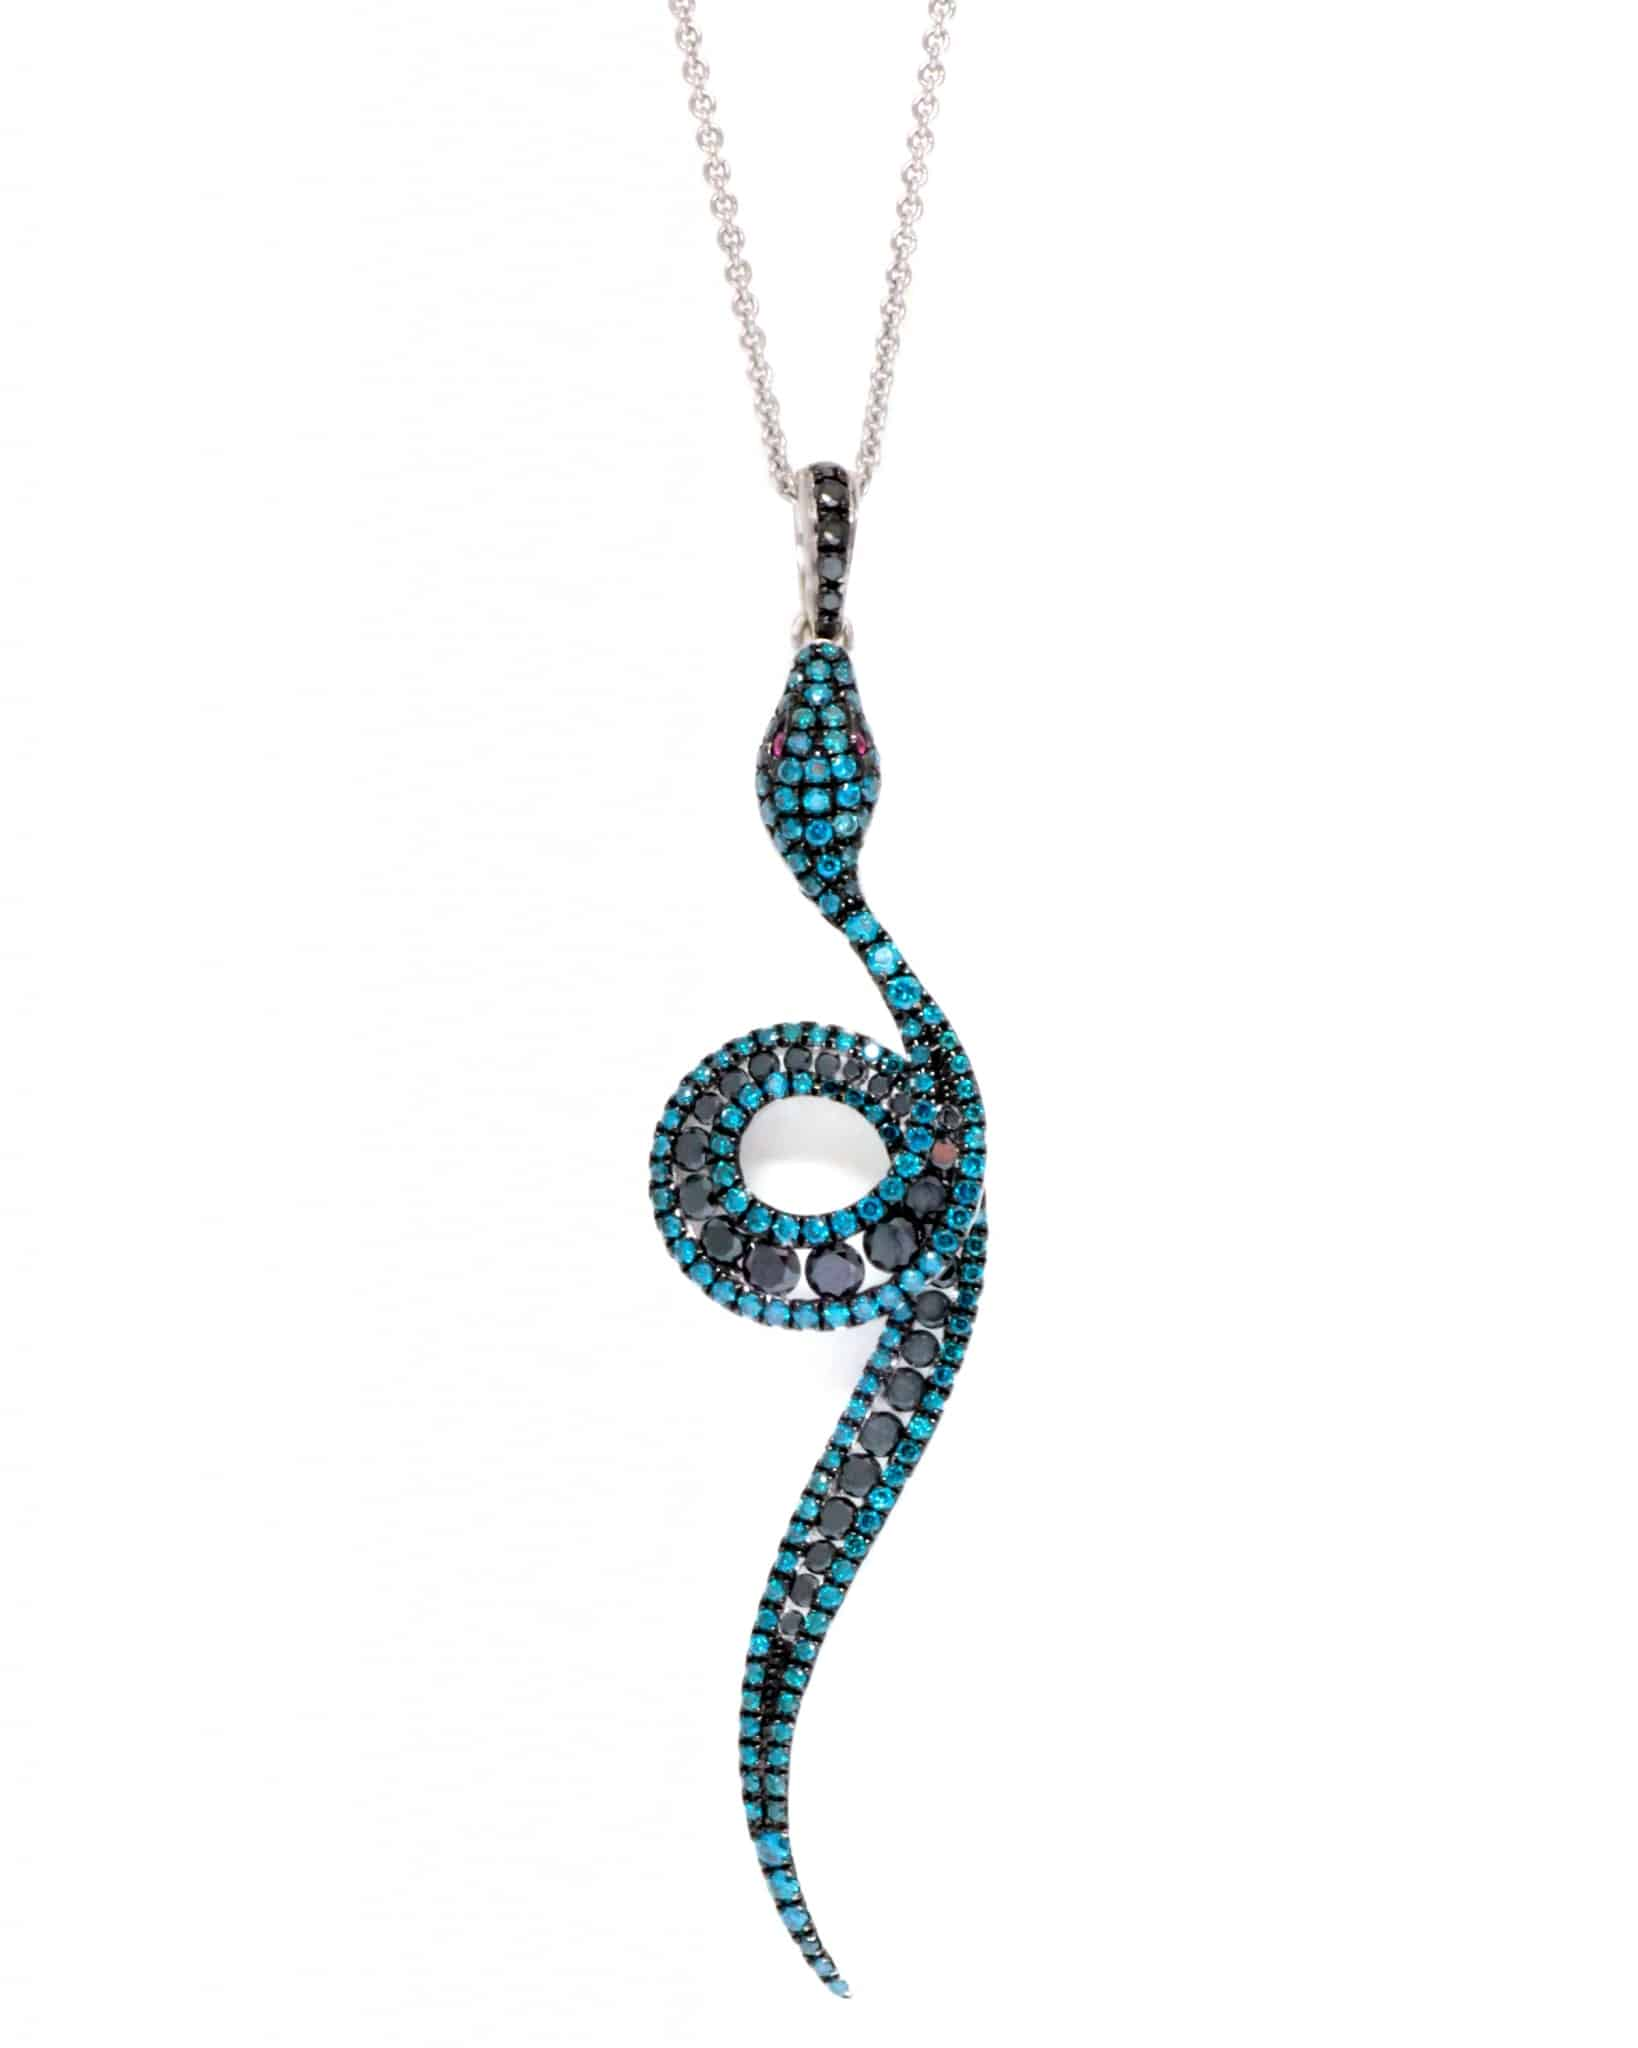 ROBERTO COIN 18K White Gold W Blue Diamond Necklace 519100AWCHBD